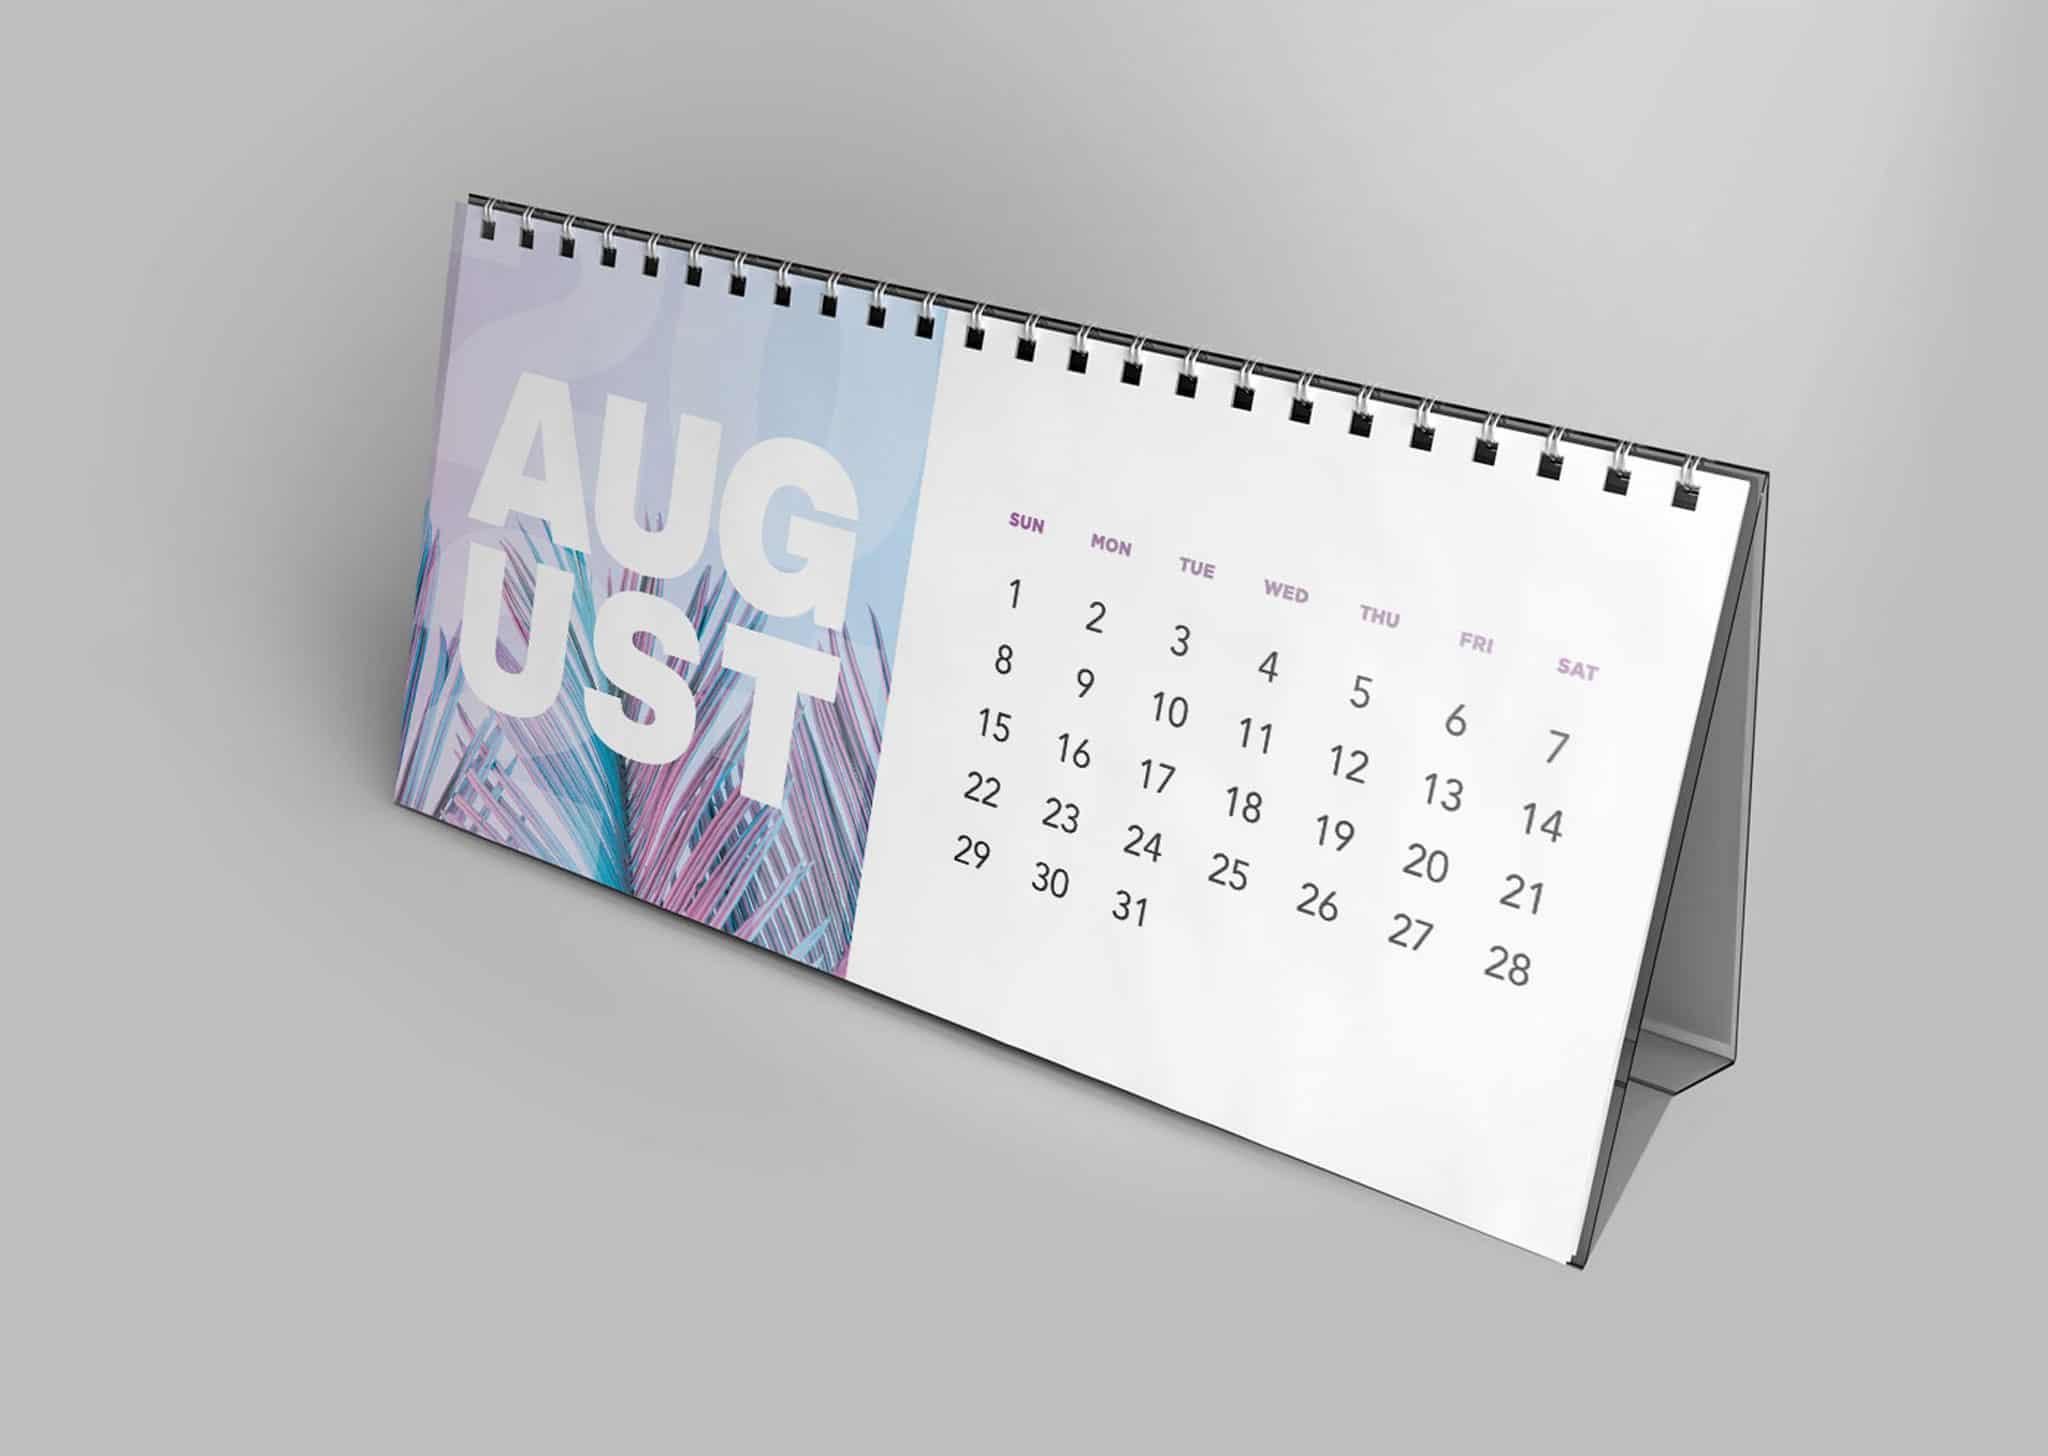 A Z Design And Print Services Desk Calendar Printing